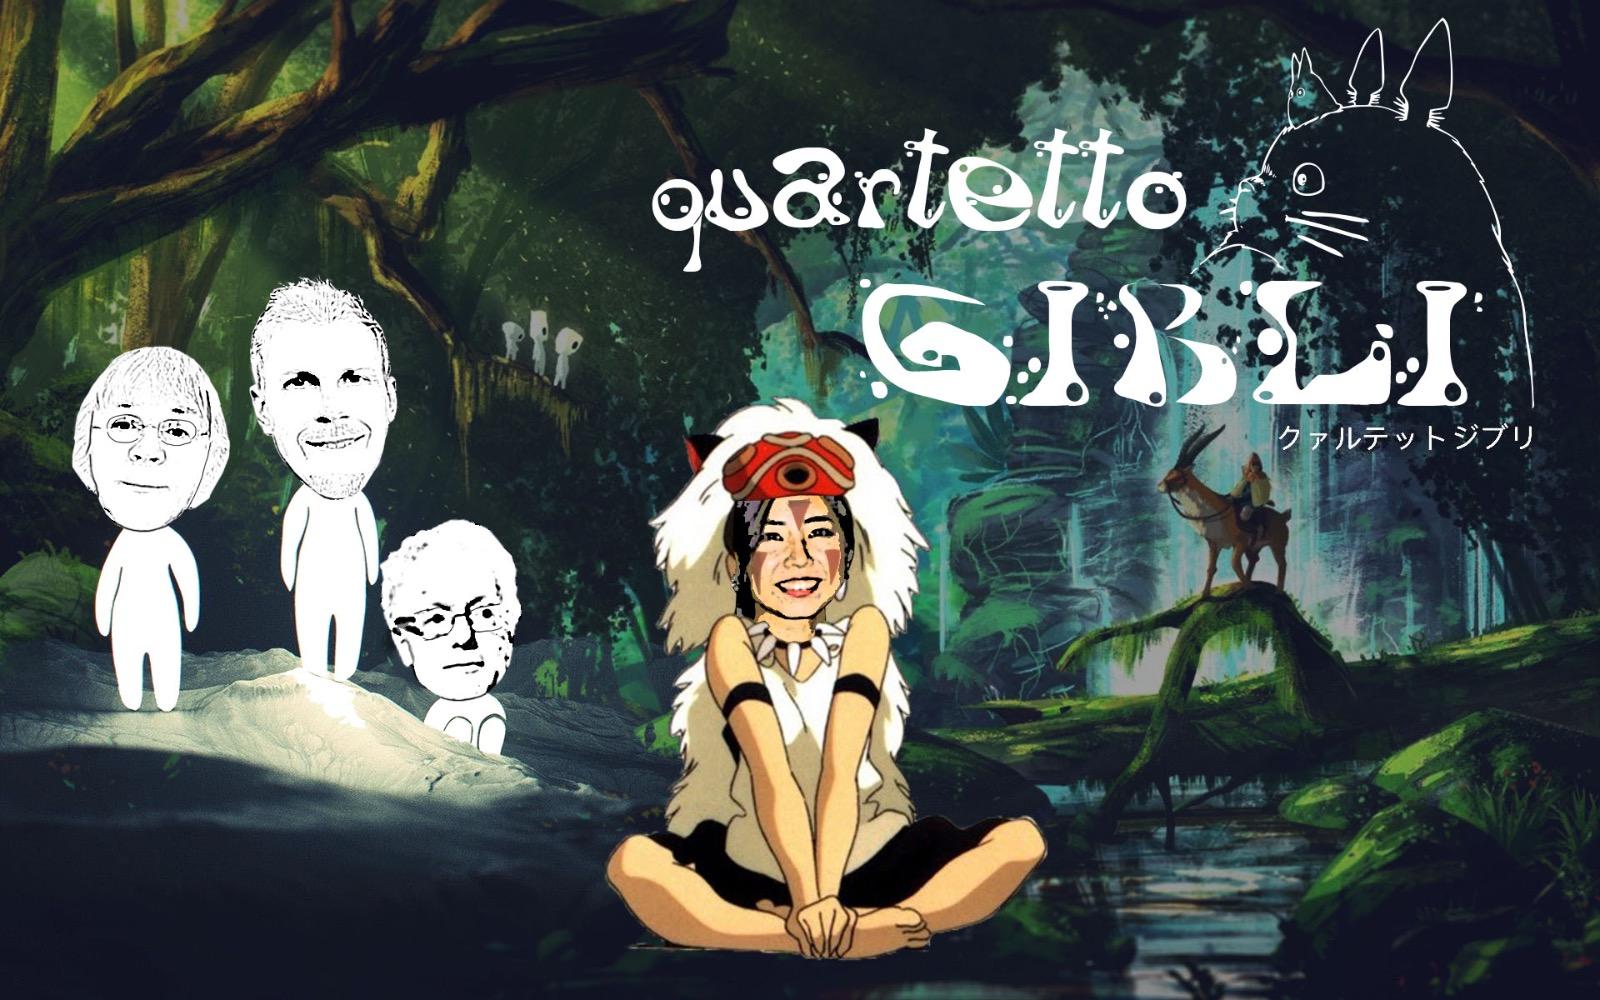 QUARTETTO GIBLI (Soundtracks)